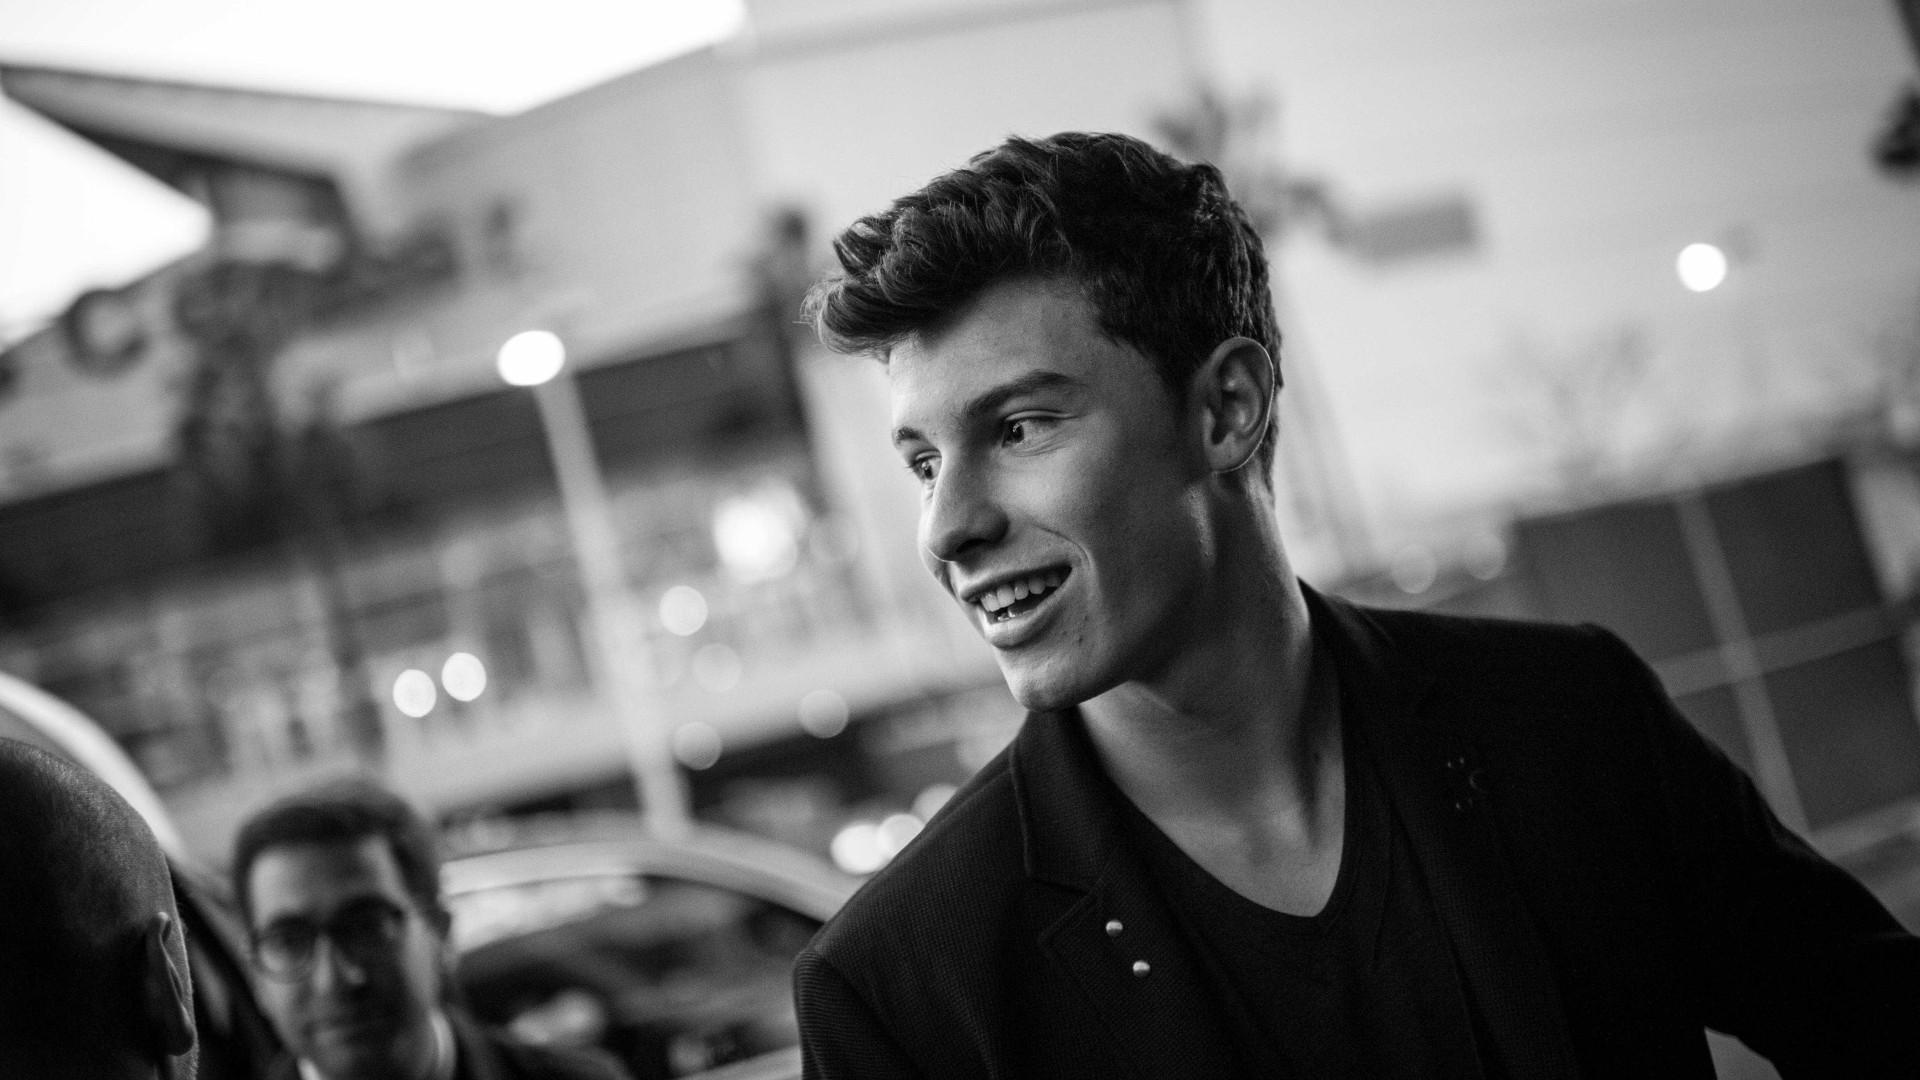 Já saiu a nova música de Shawn Mendes